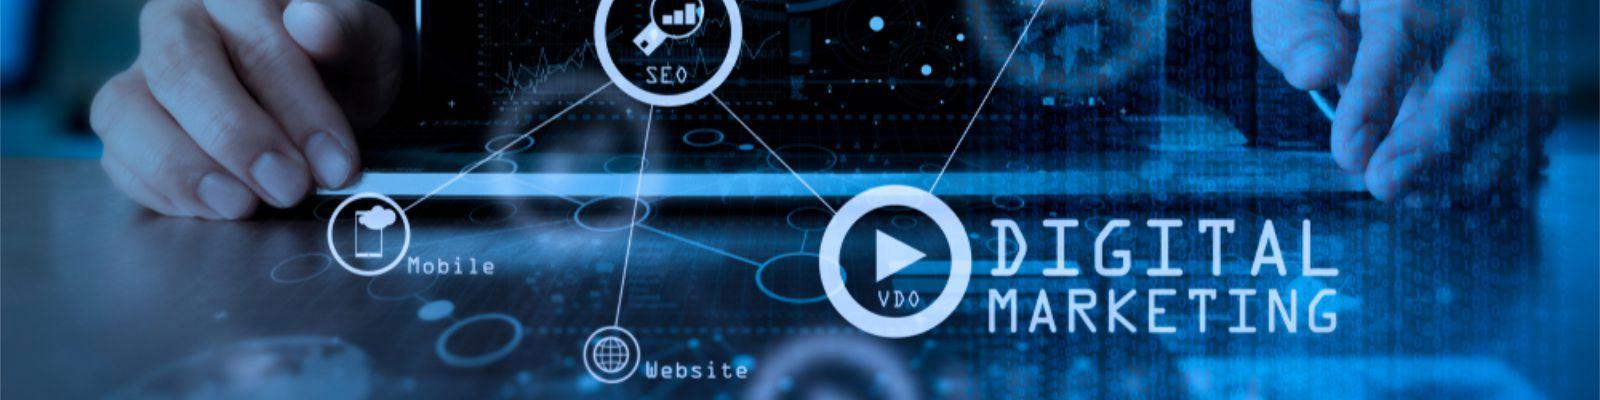 Virtual Digital Marketing Manager_Parallex